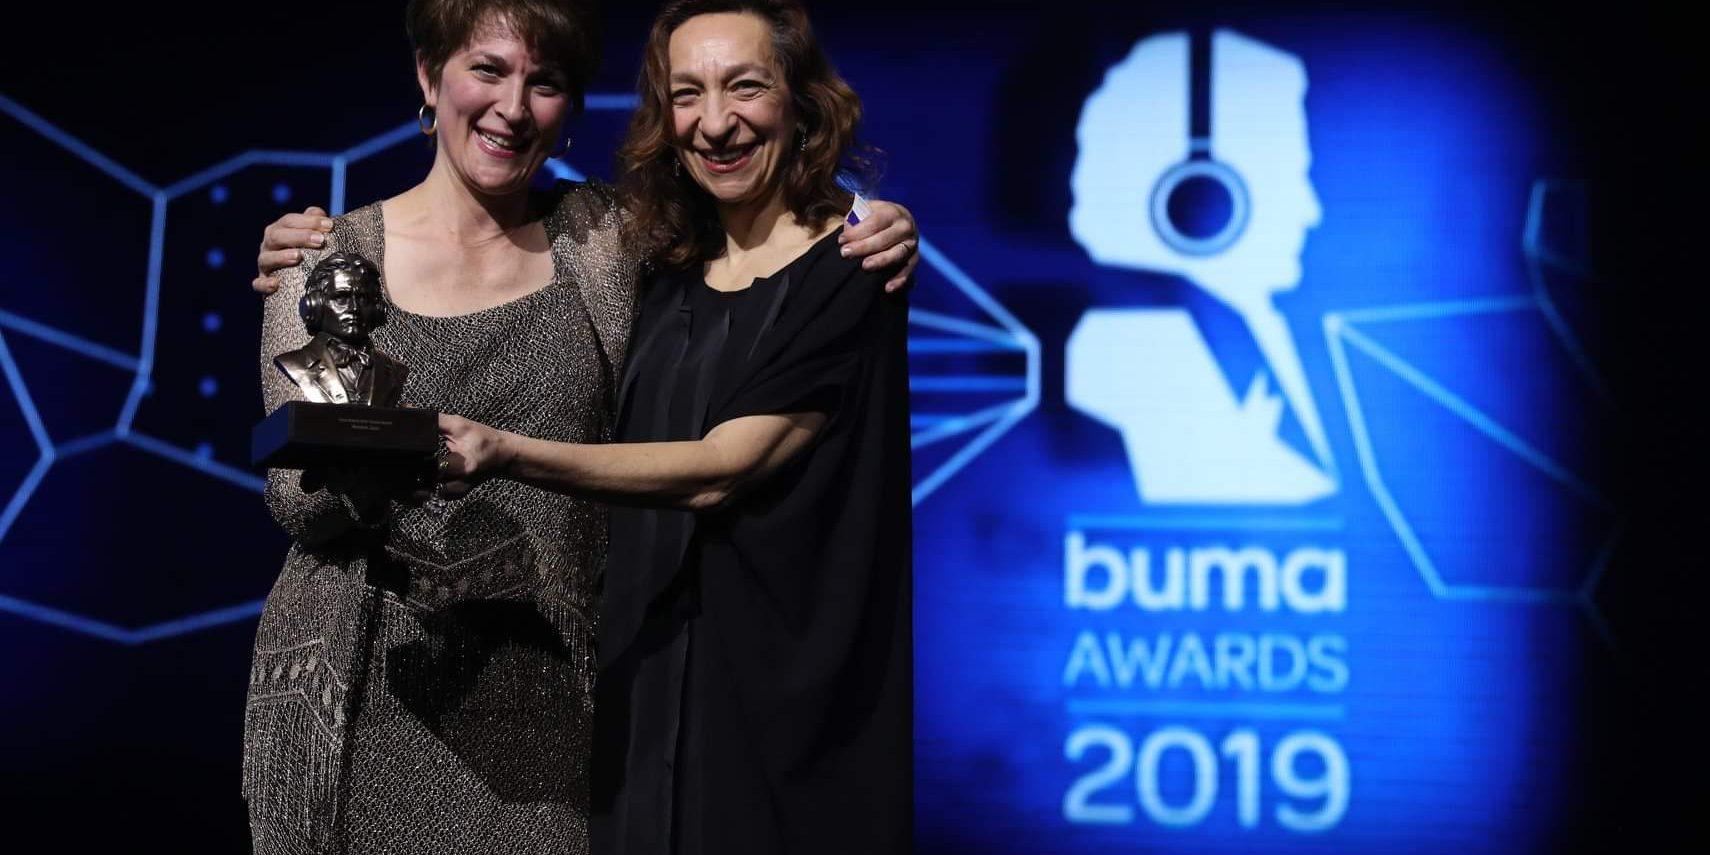 Vanessa Lann wint Buma Classical Award 2019